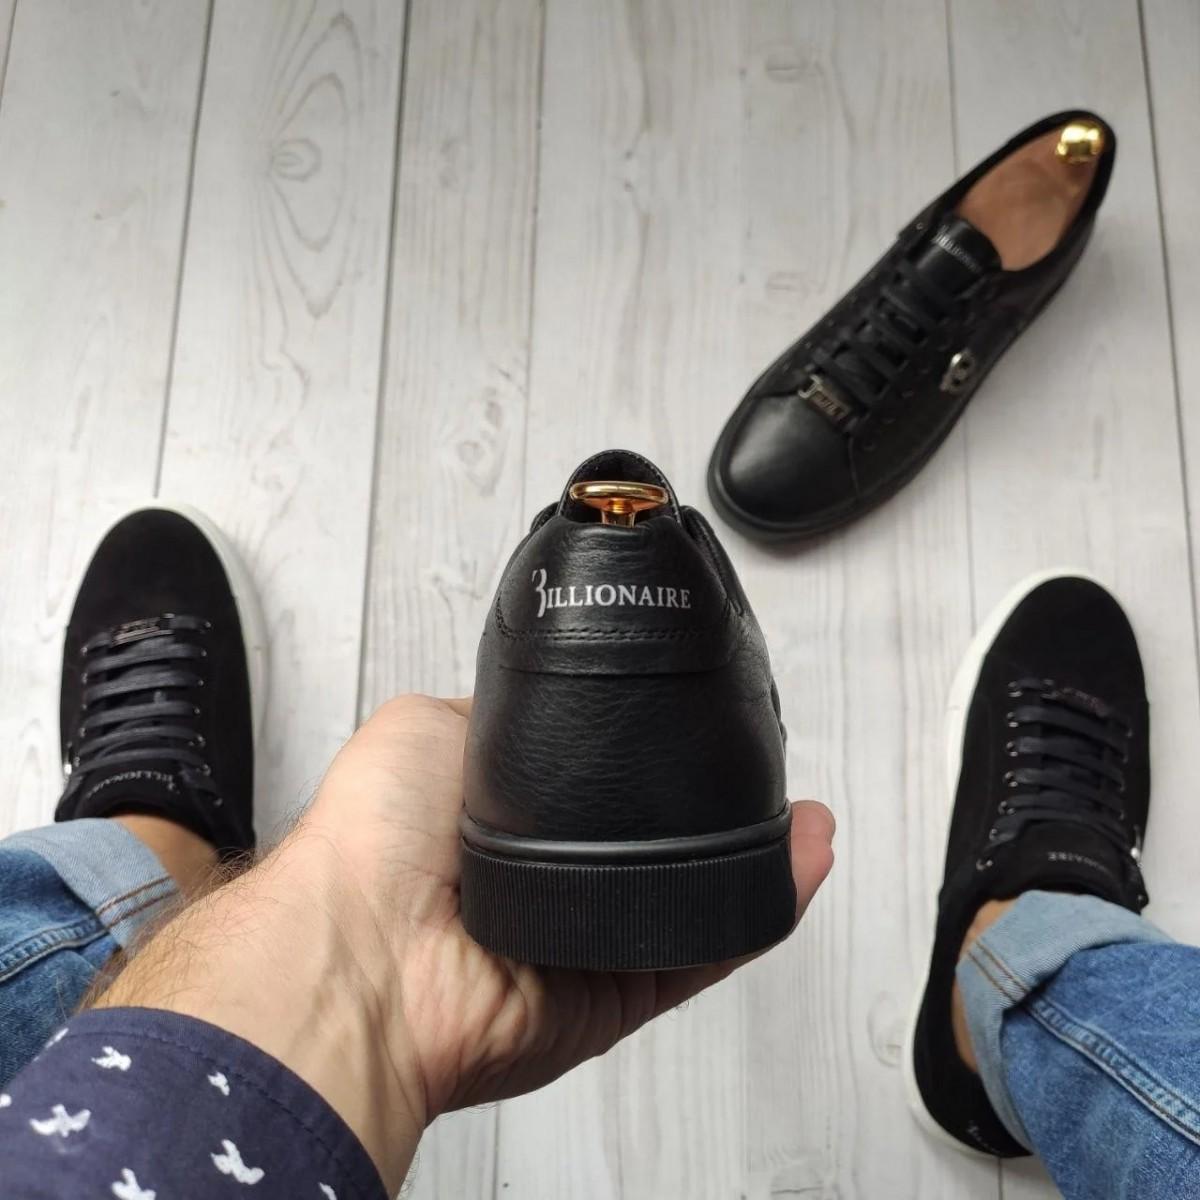 Кеды кроссовки мужские кожаные Billionaire Embossed Leather